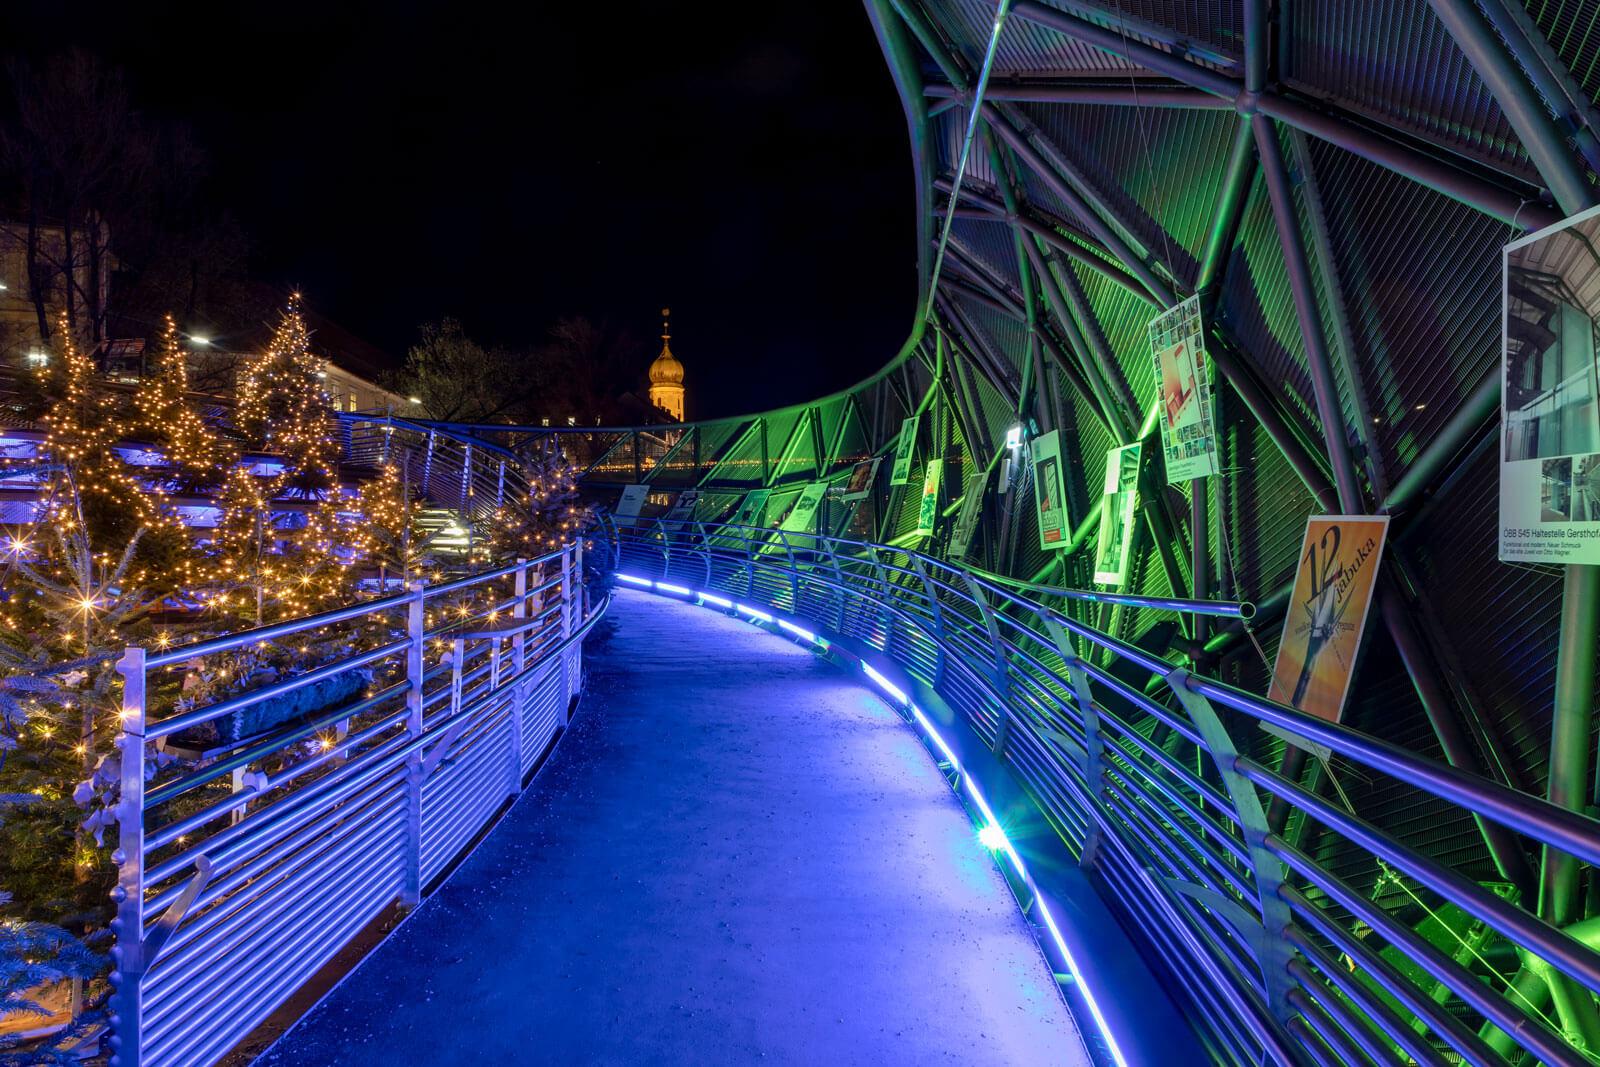 2021/01/Advent-Graz-Mariazell-4.jpg